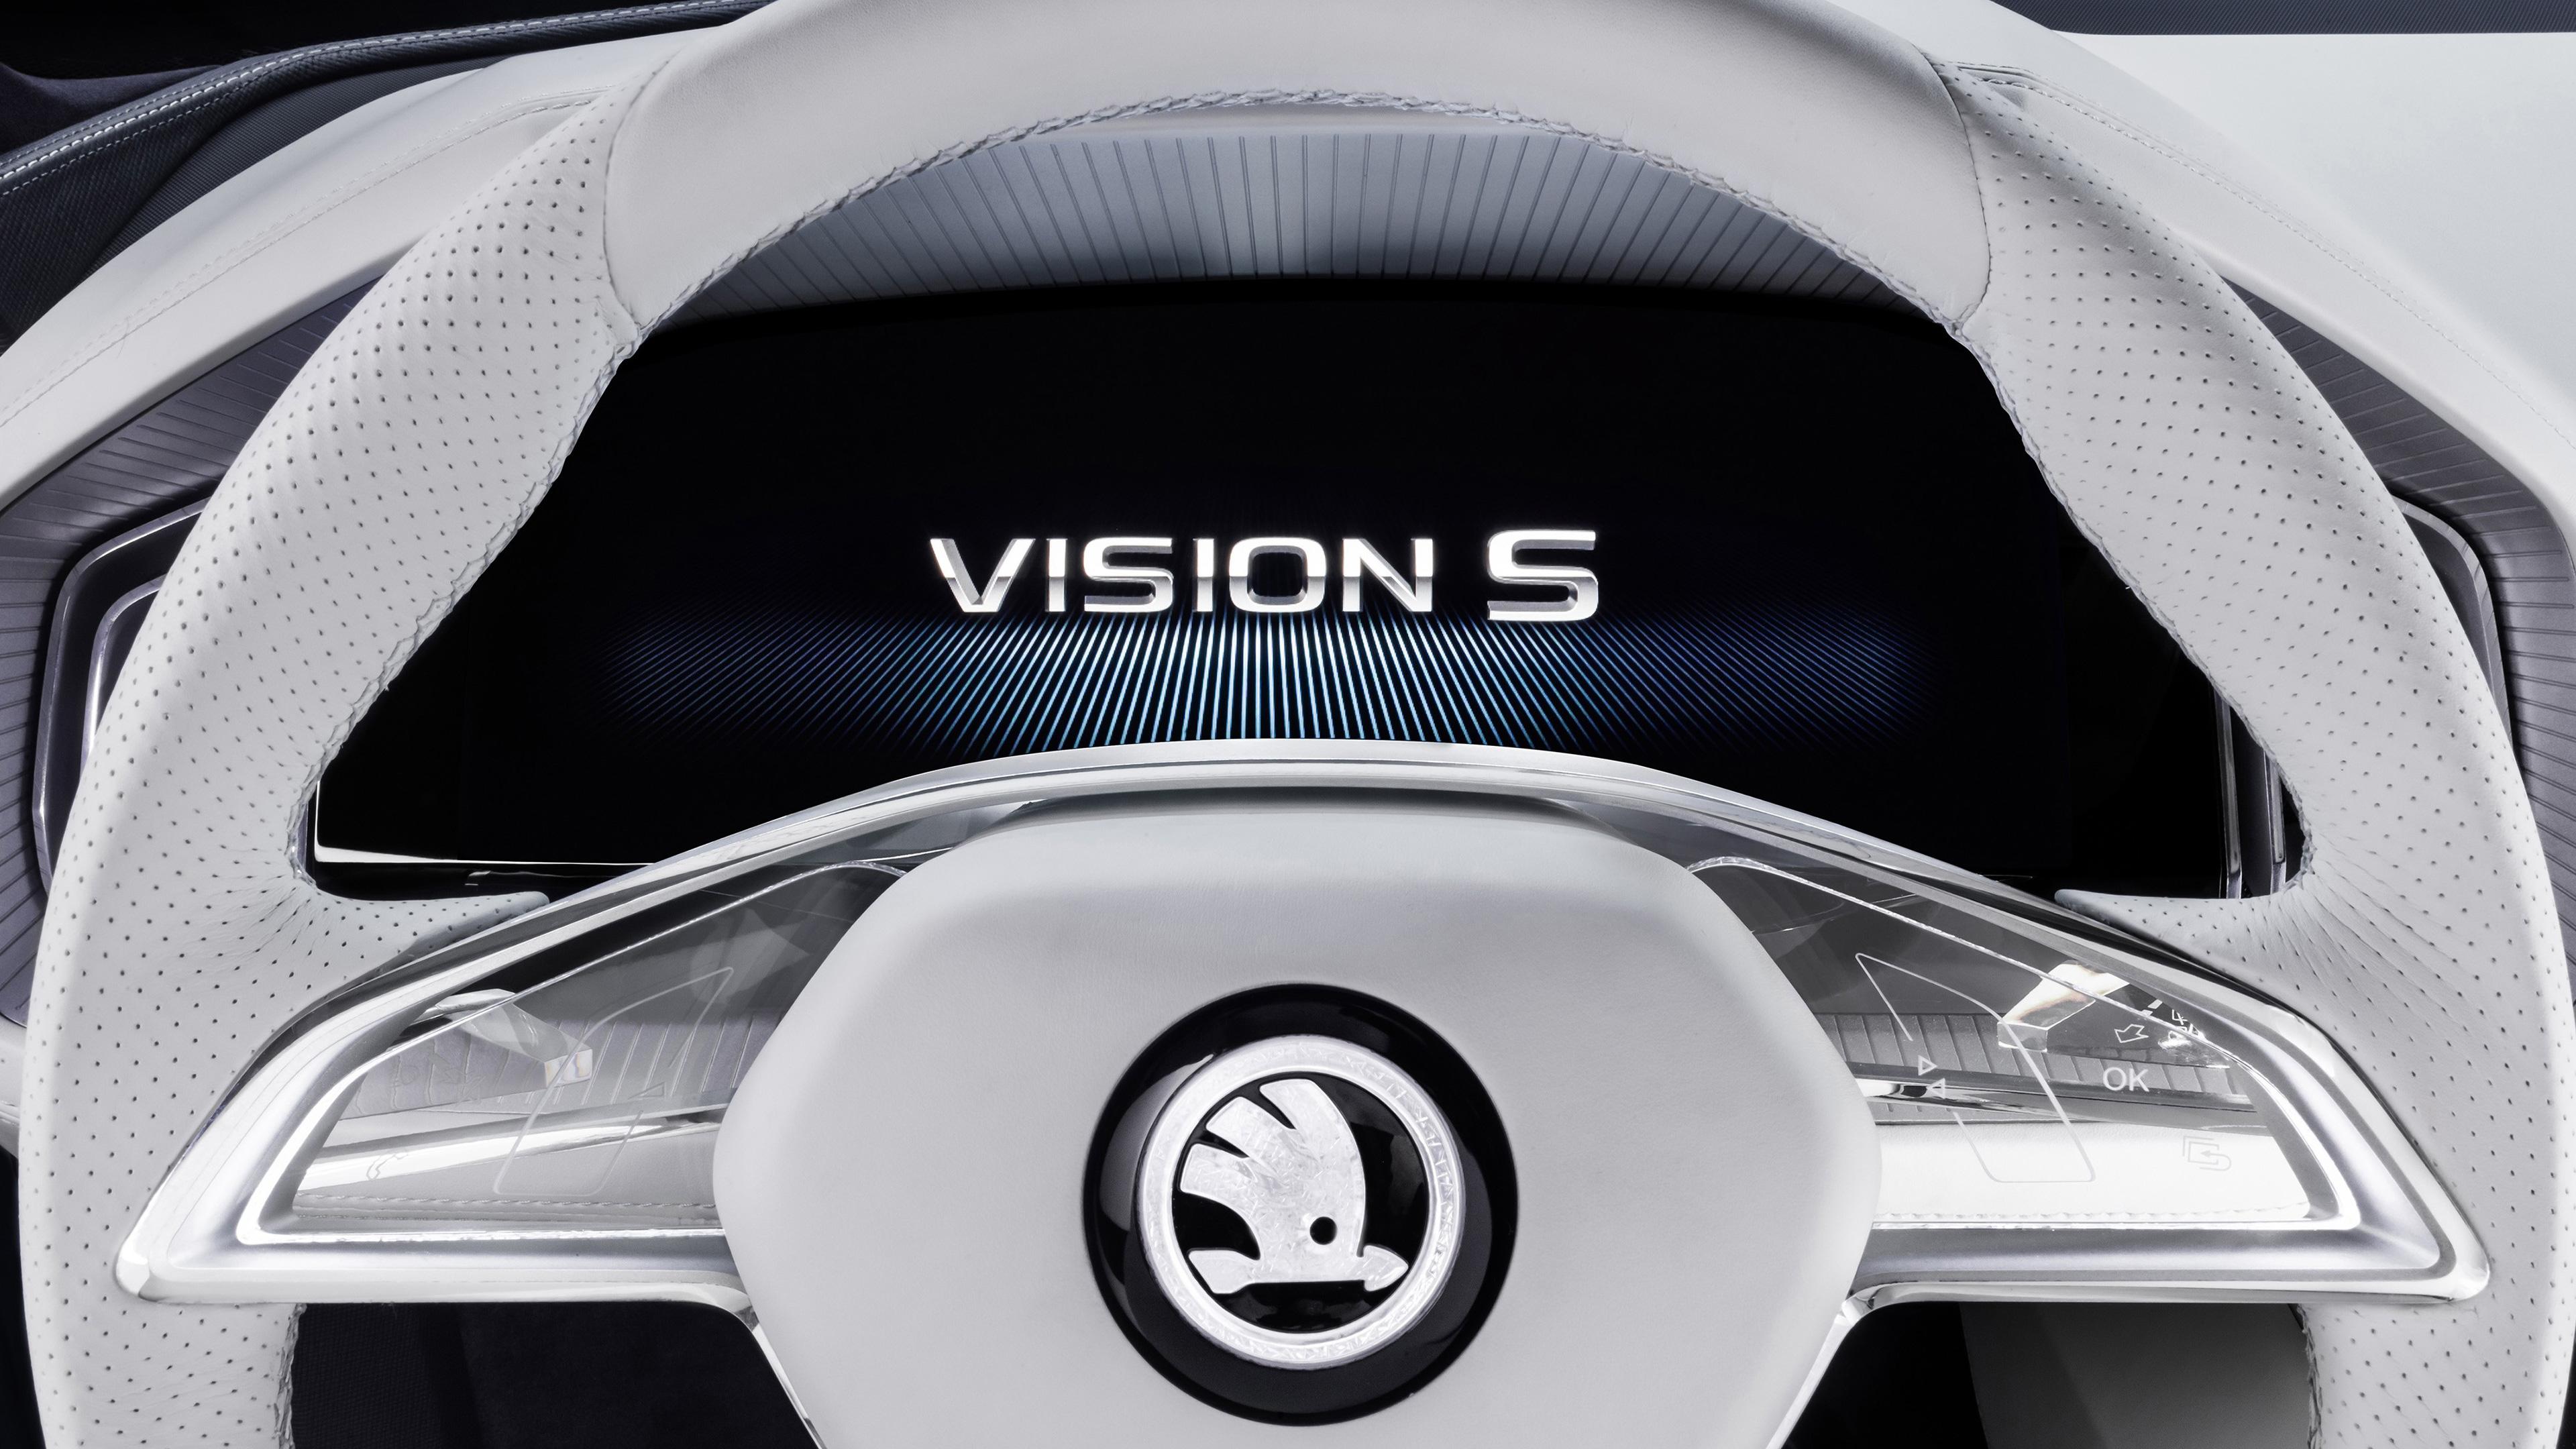 Qhd Car Wallpapers Skoda Vision S Logo Wallpapers Hd Wallpapers Id 17688